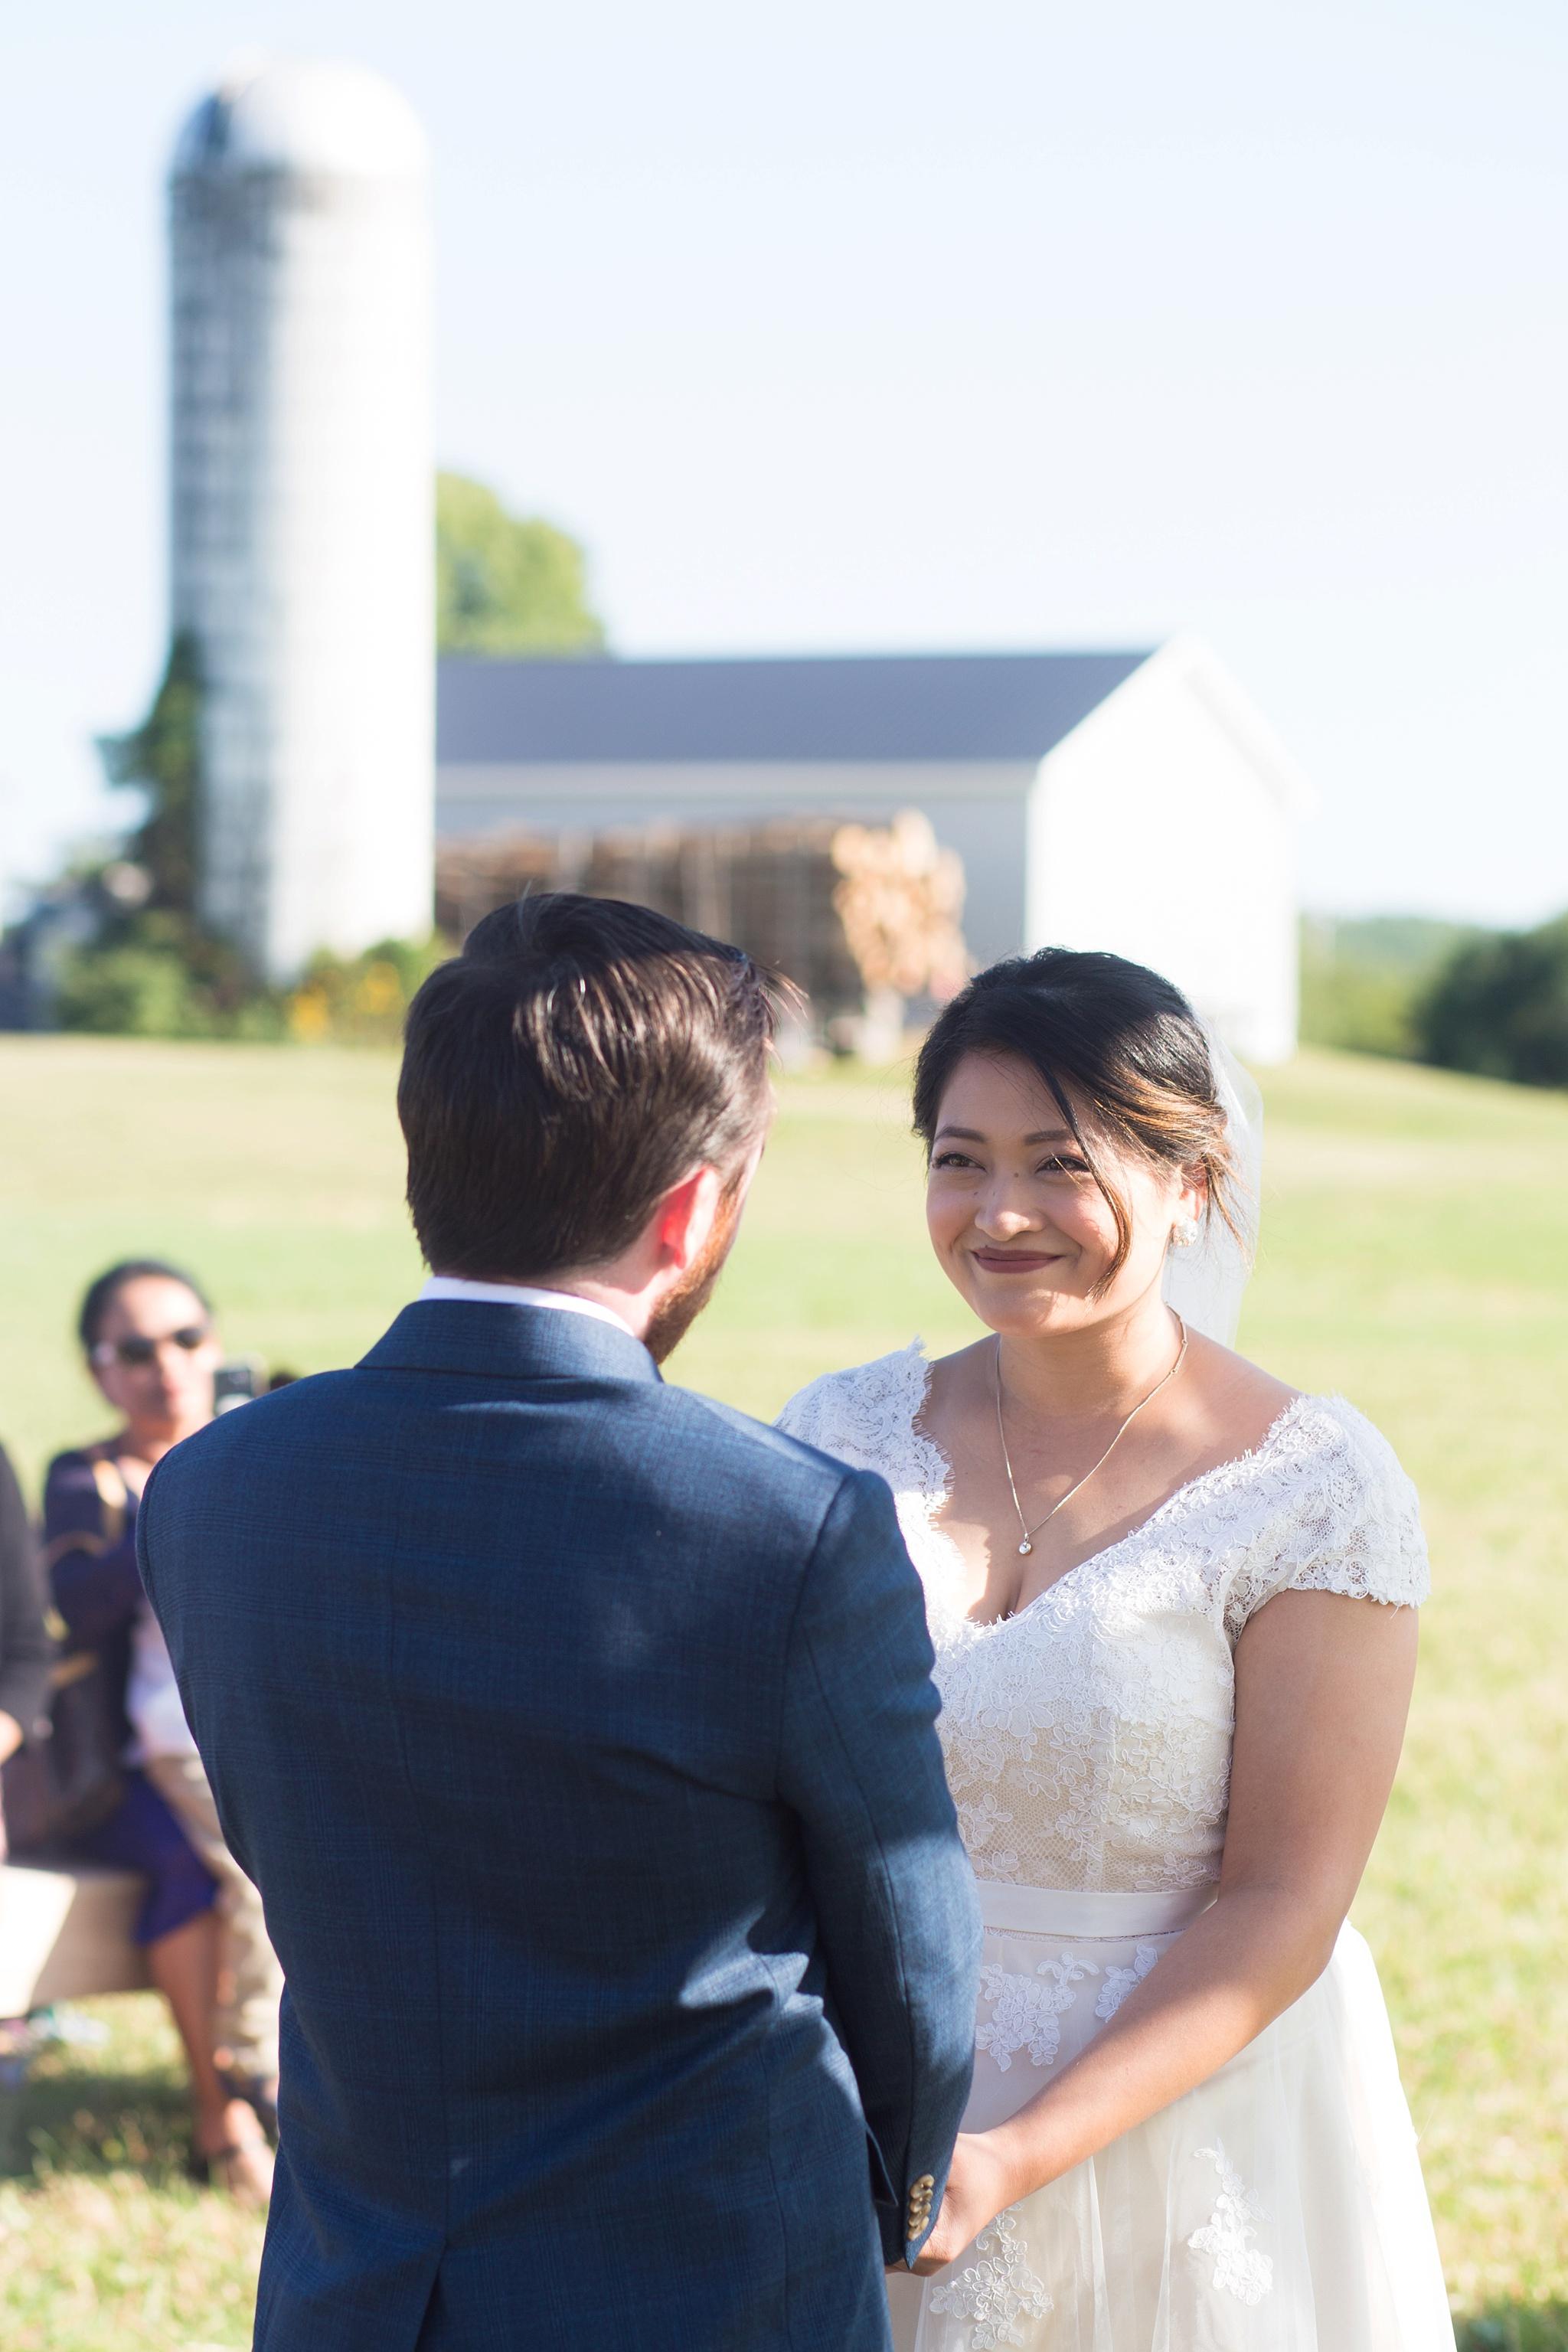 weddings at farms